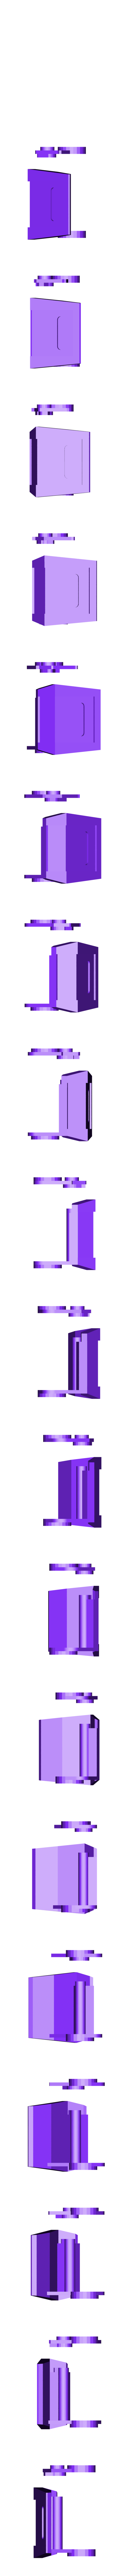 Thighright3.stl Download STL file KO TFC Uranos Upgrade Kit IDW Ver • 3D printer object, Toymakr3D